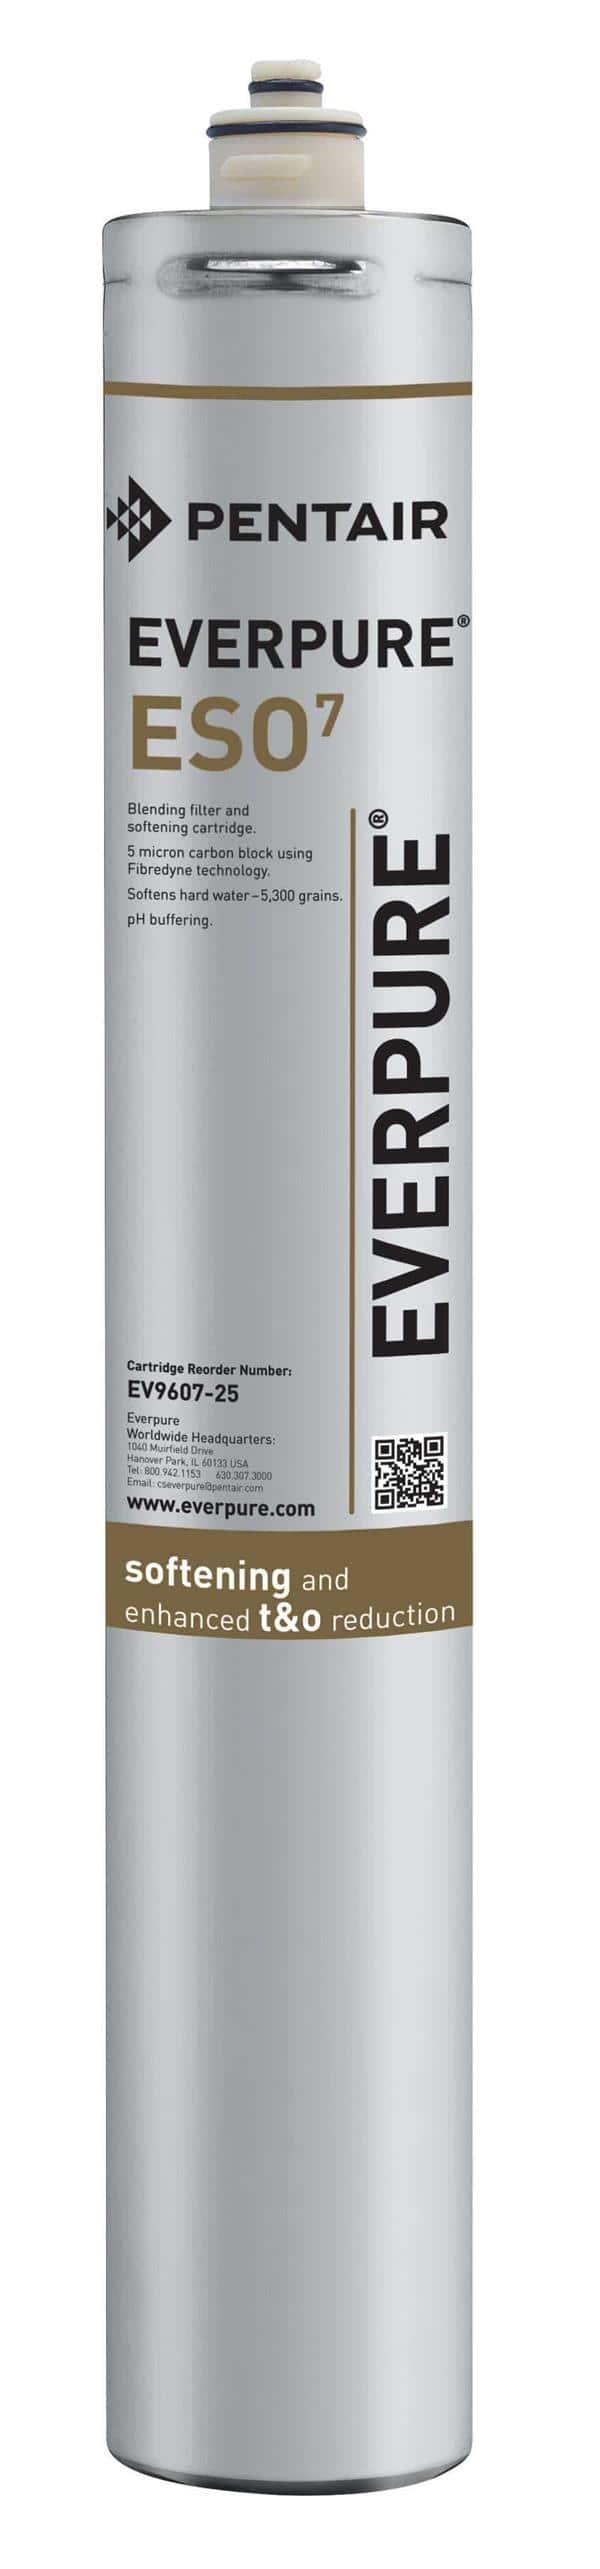 Everpure EV960725 ESO 7 Cartridge